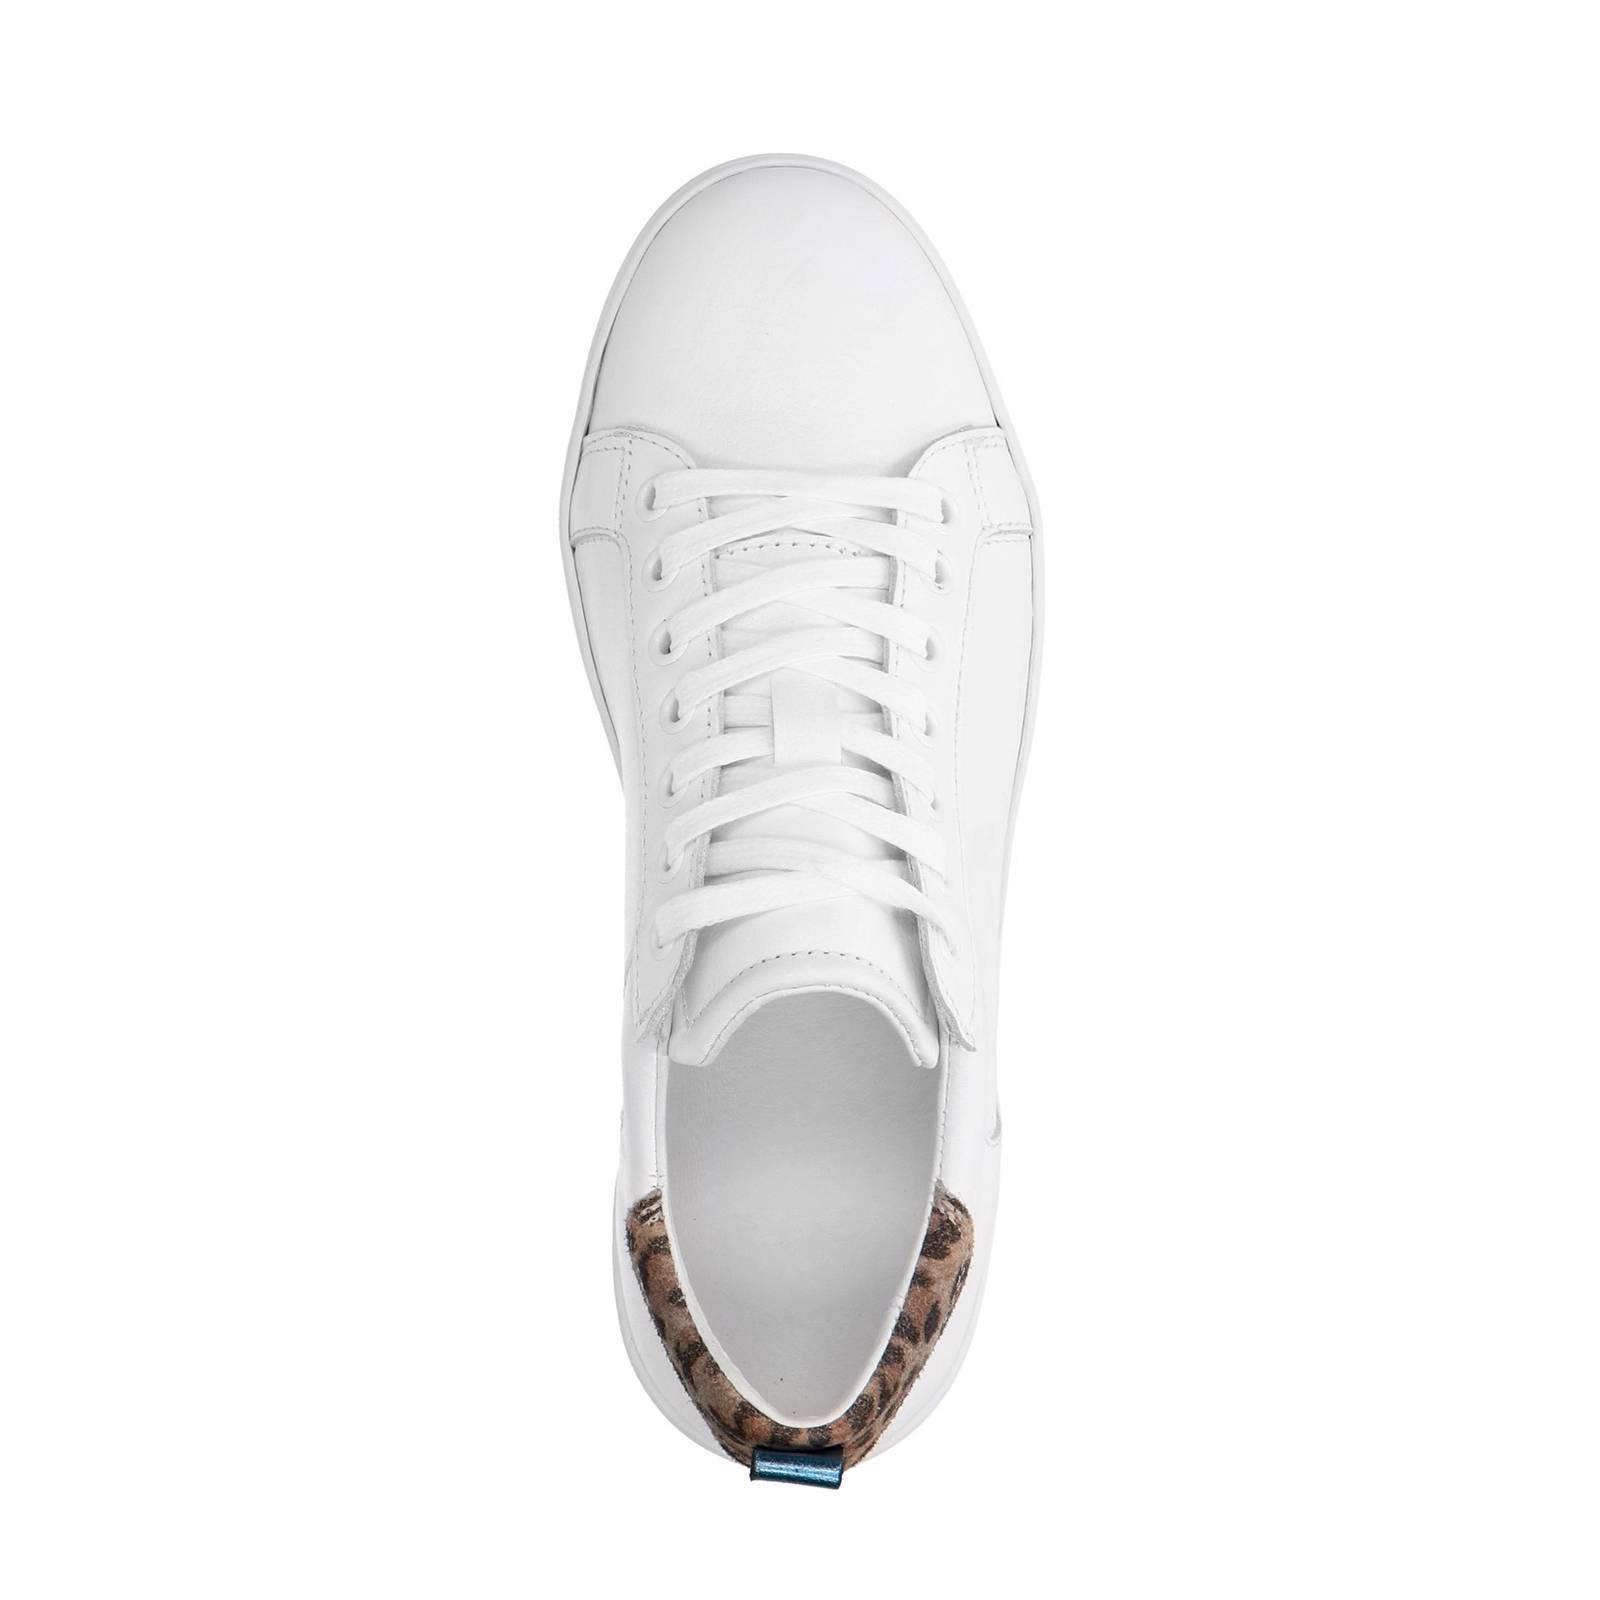 90dc3aed44f Manfield leren sneakers met luipaardprint wit   wehkamp